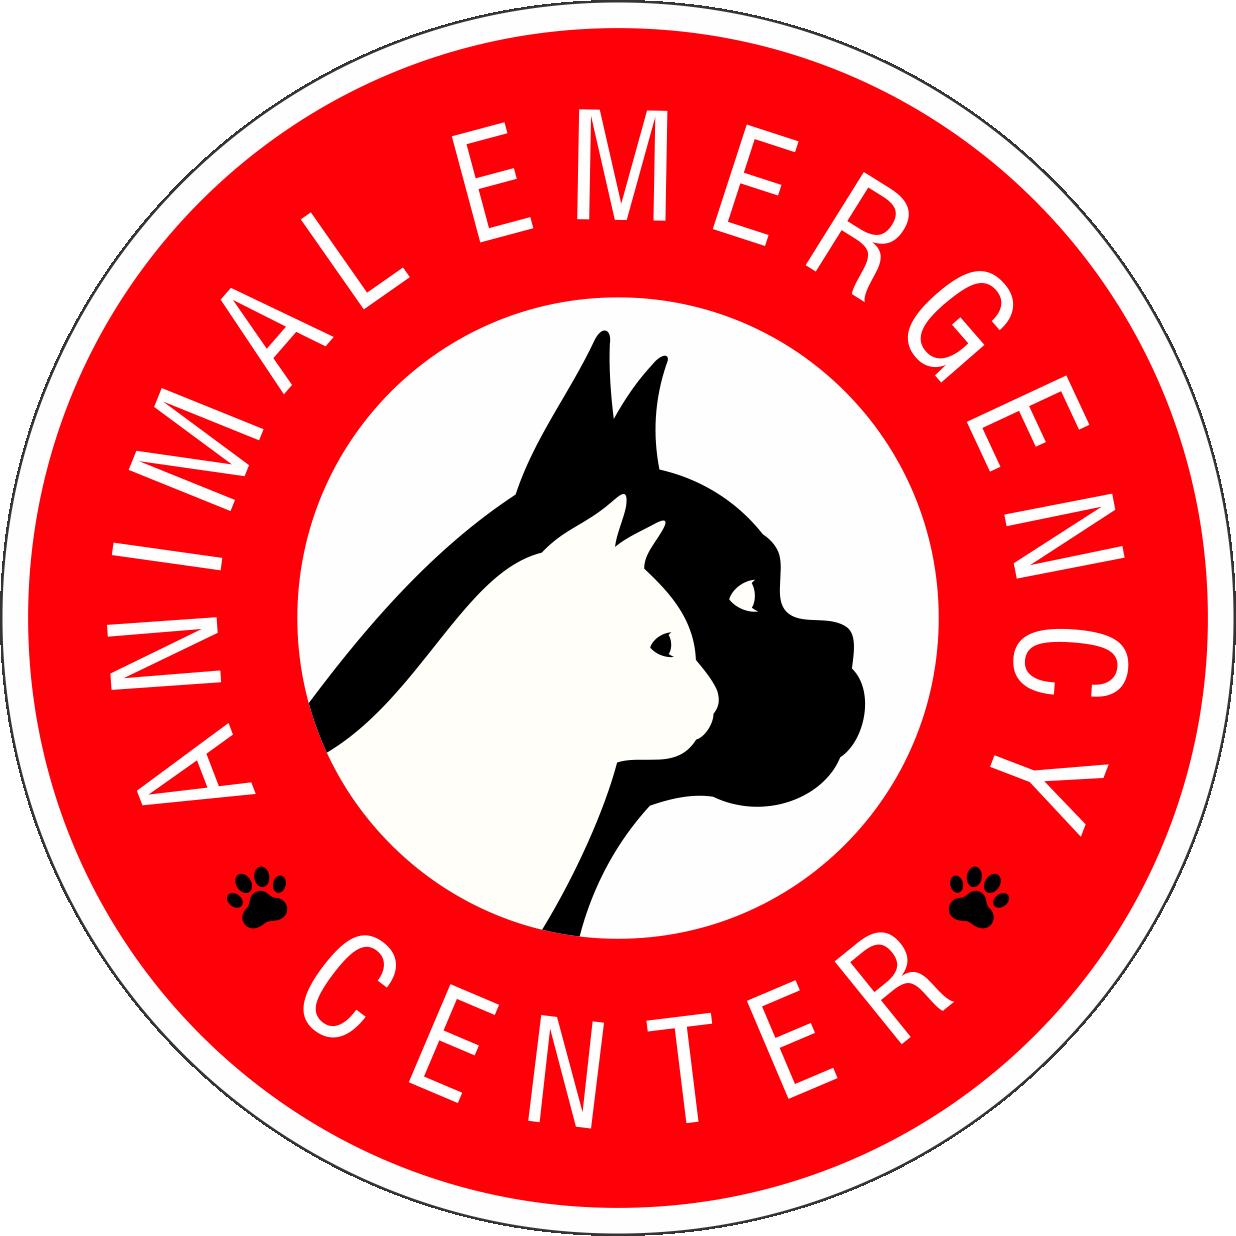 Emergency clipart emergency hotline. Animal center